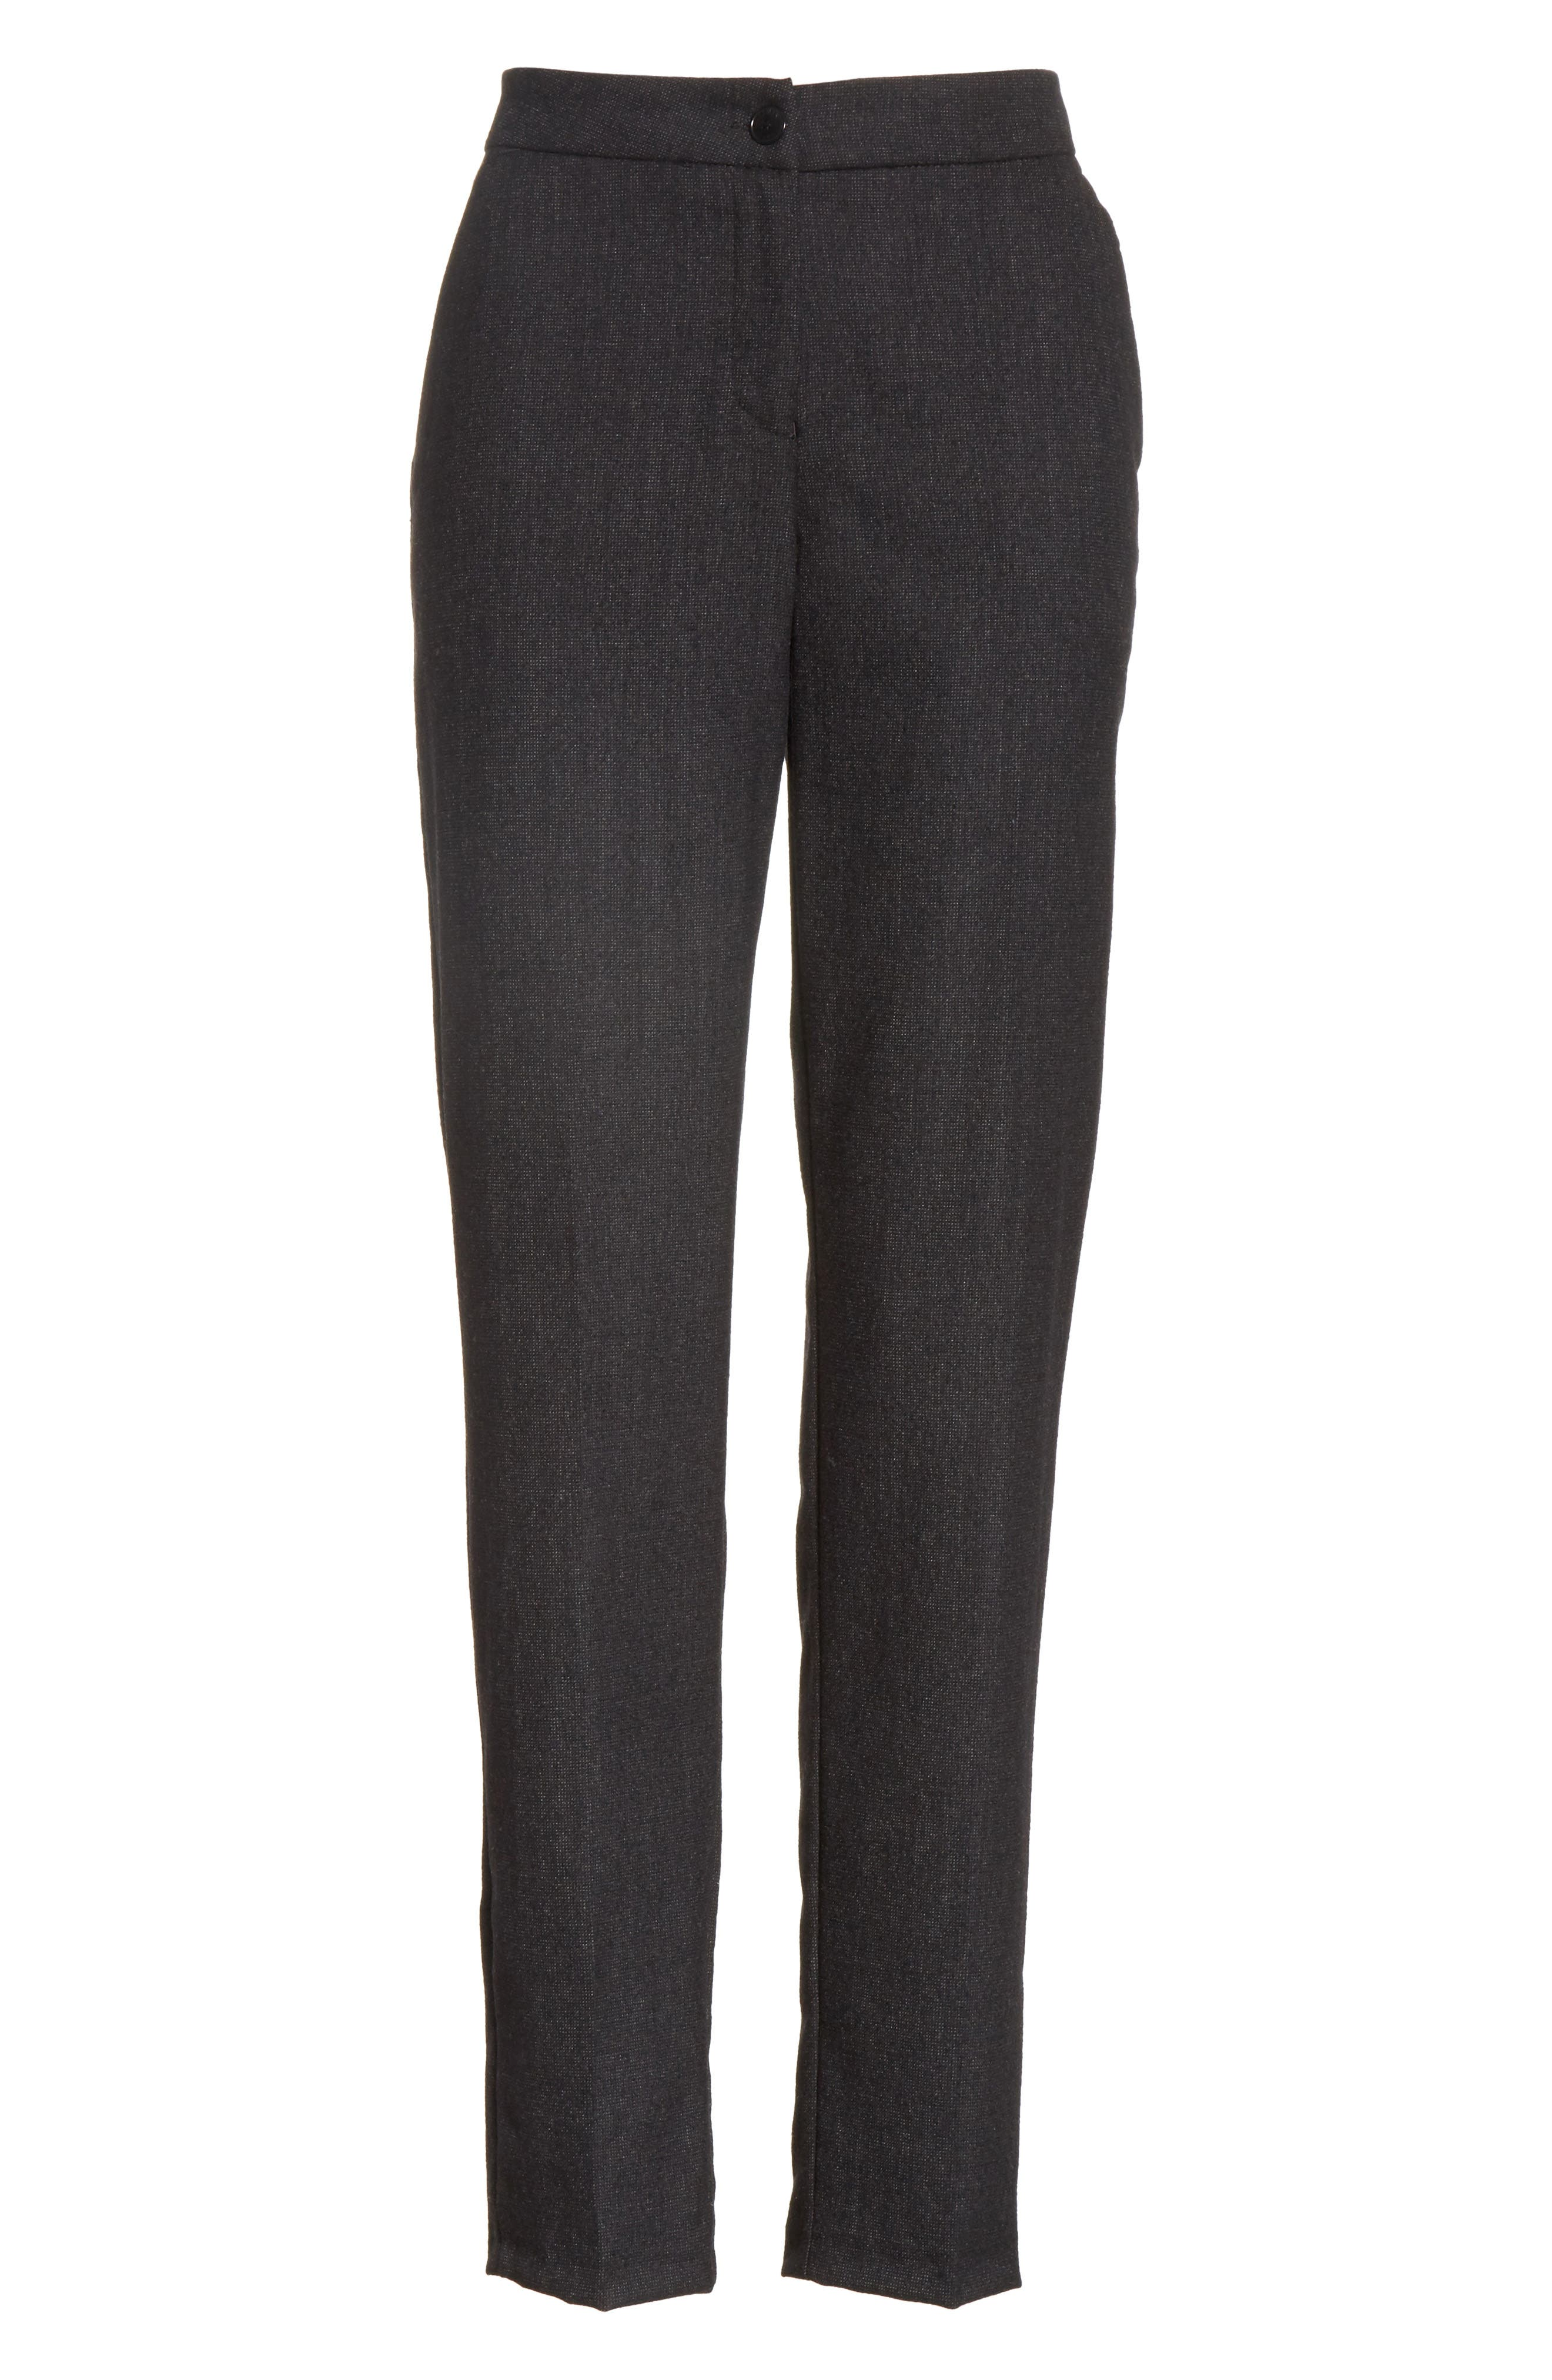 Armani Jeans Stretch Wool Slim Pants,                             Alternate thumbnail 6, color,                             001